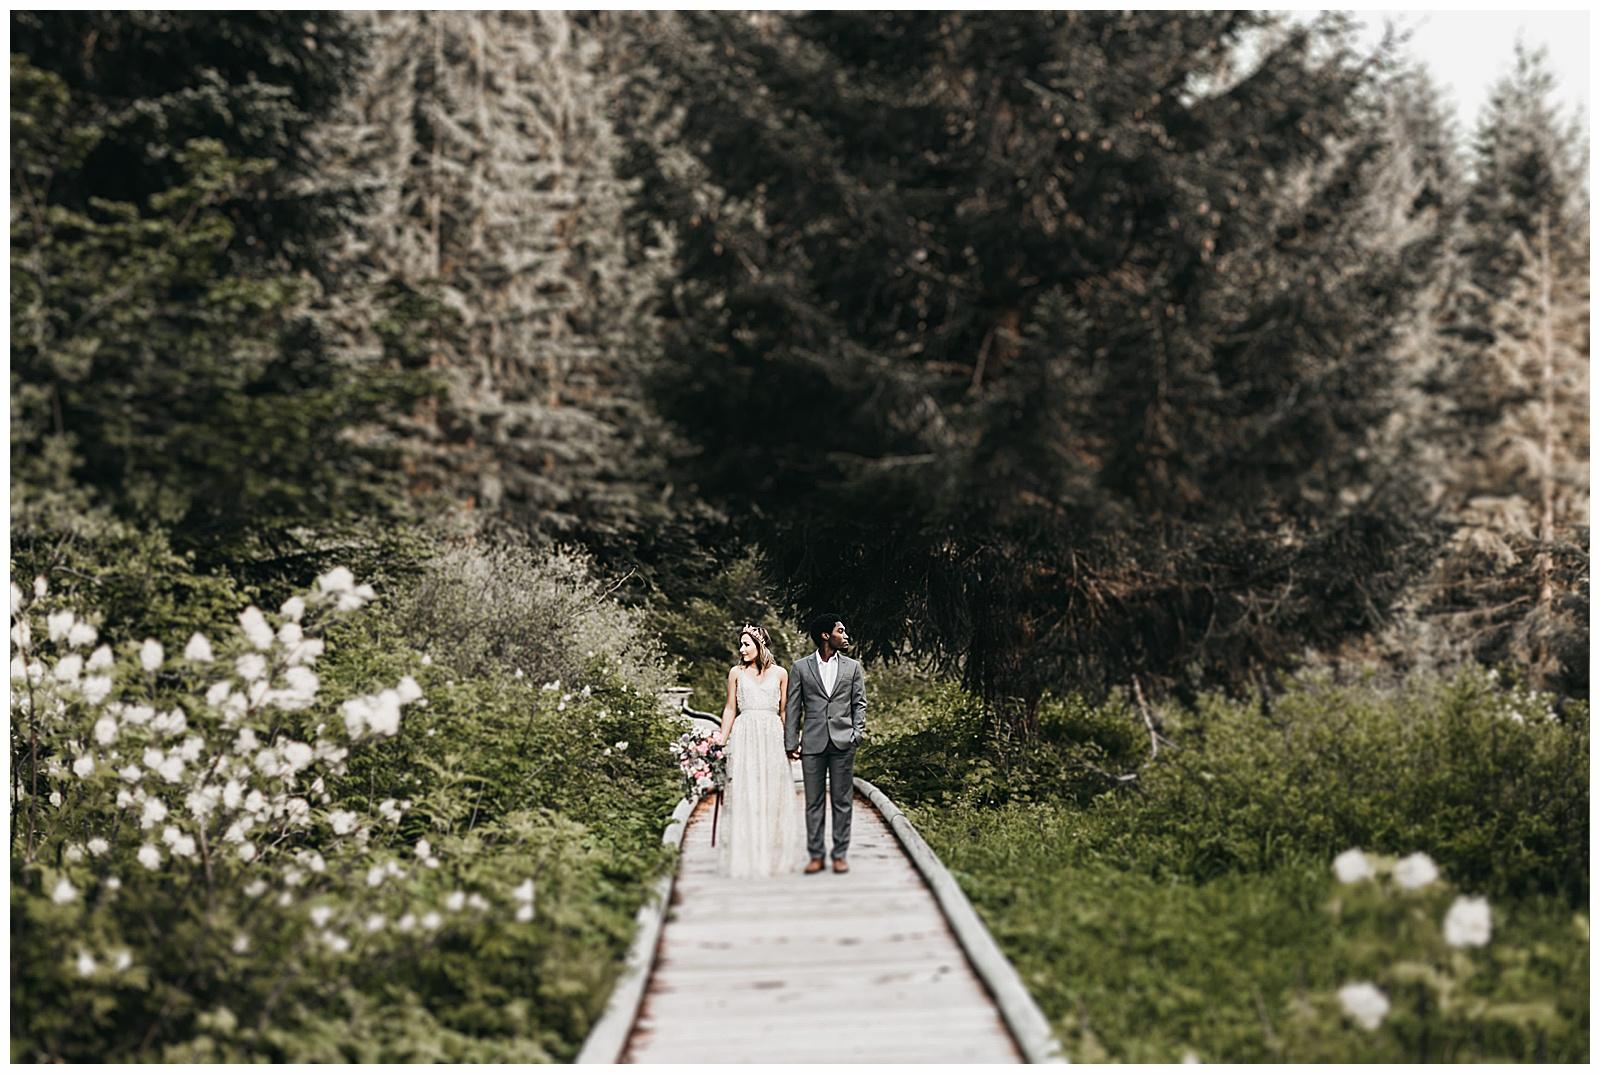 seattle-wedding-photographer-seattle-elopement-photographer-anniezav_0033.jpg